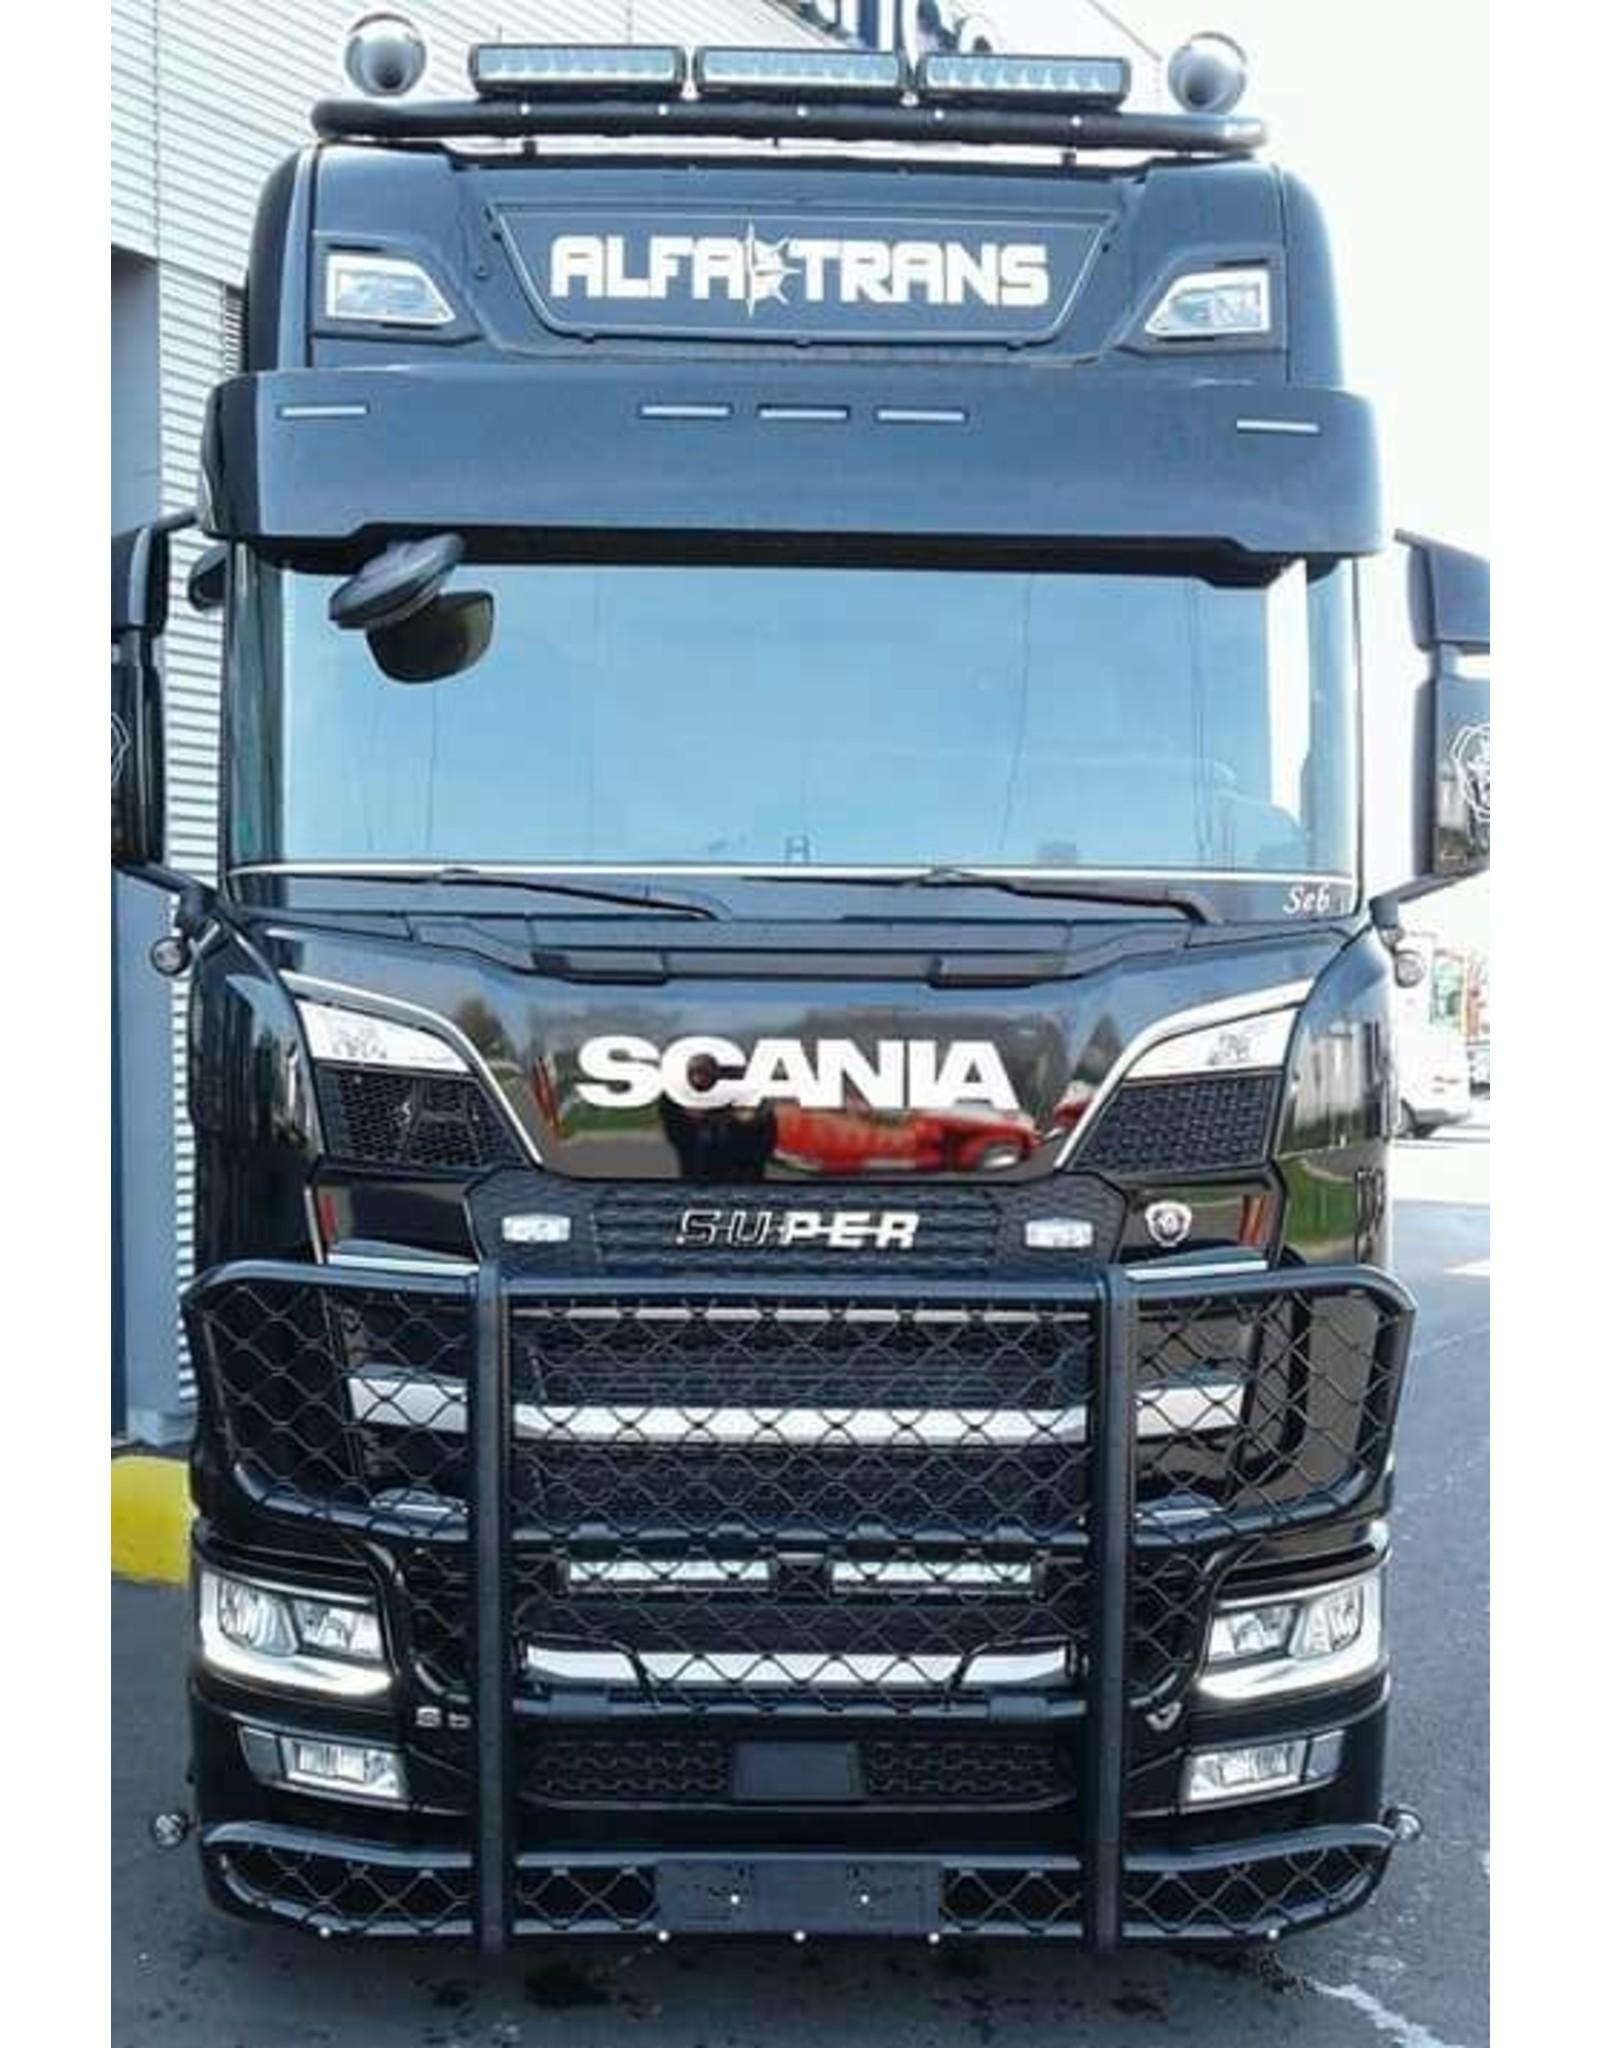 Scania Zonneklep Scania NG / Kunststof 34 cm met 5 toplamp gaten